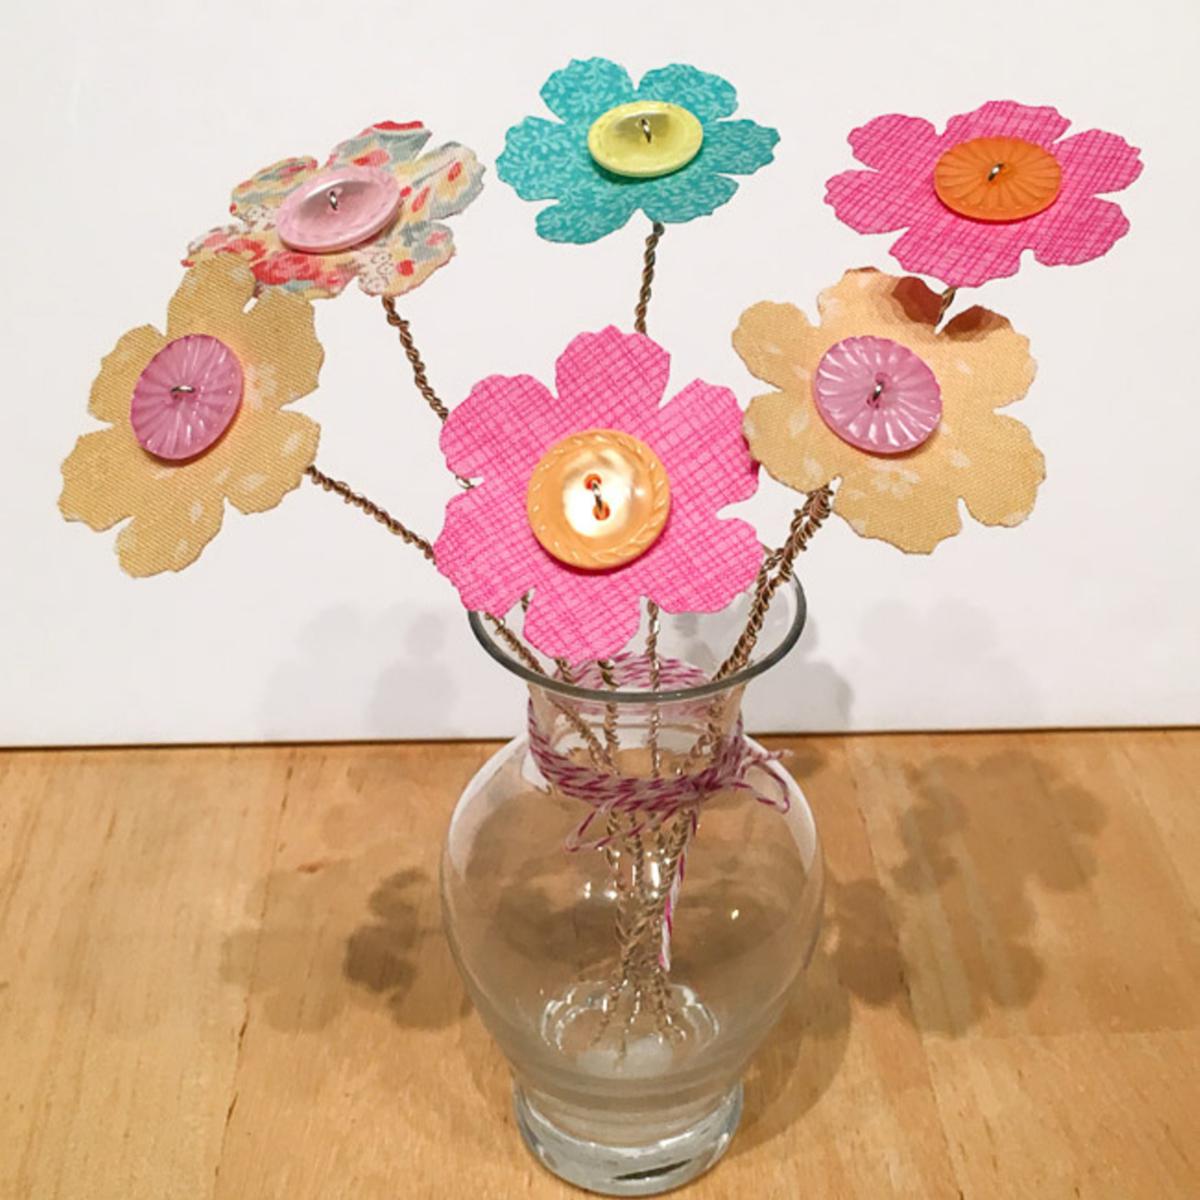 Create a button bouquet